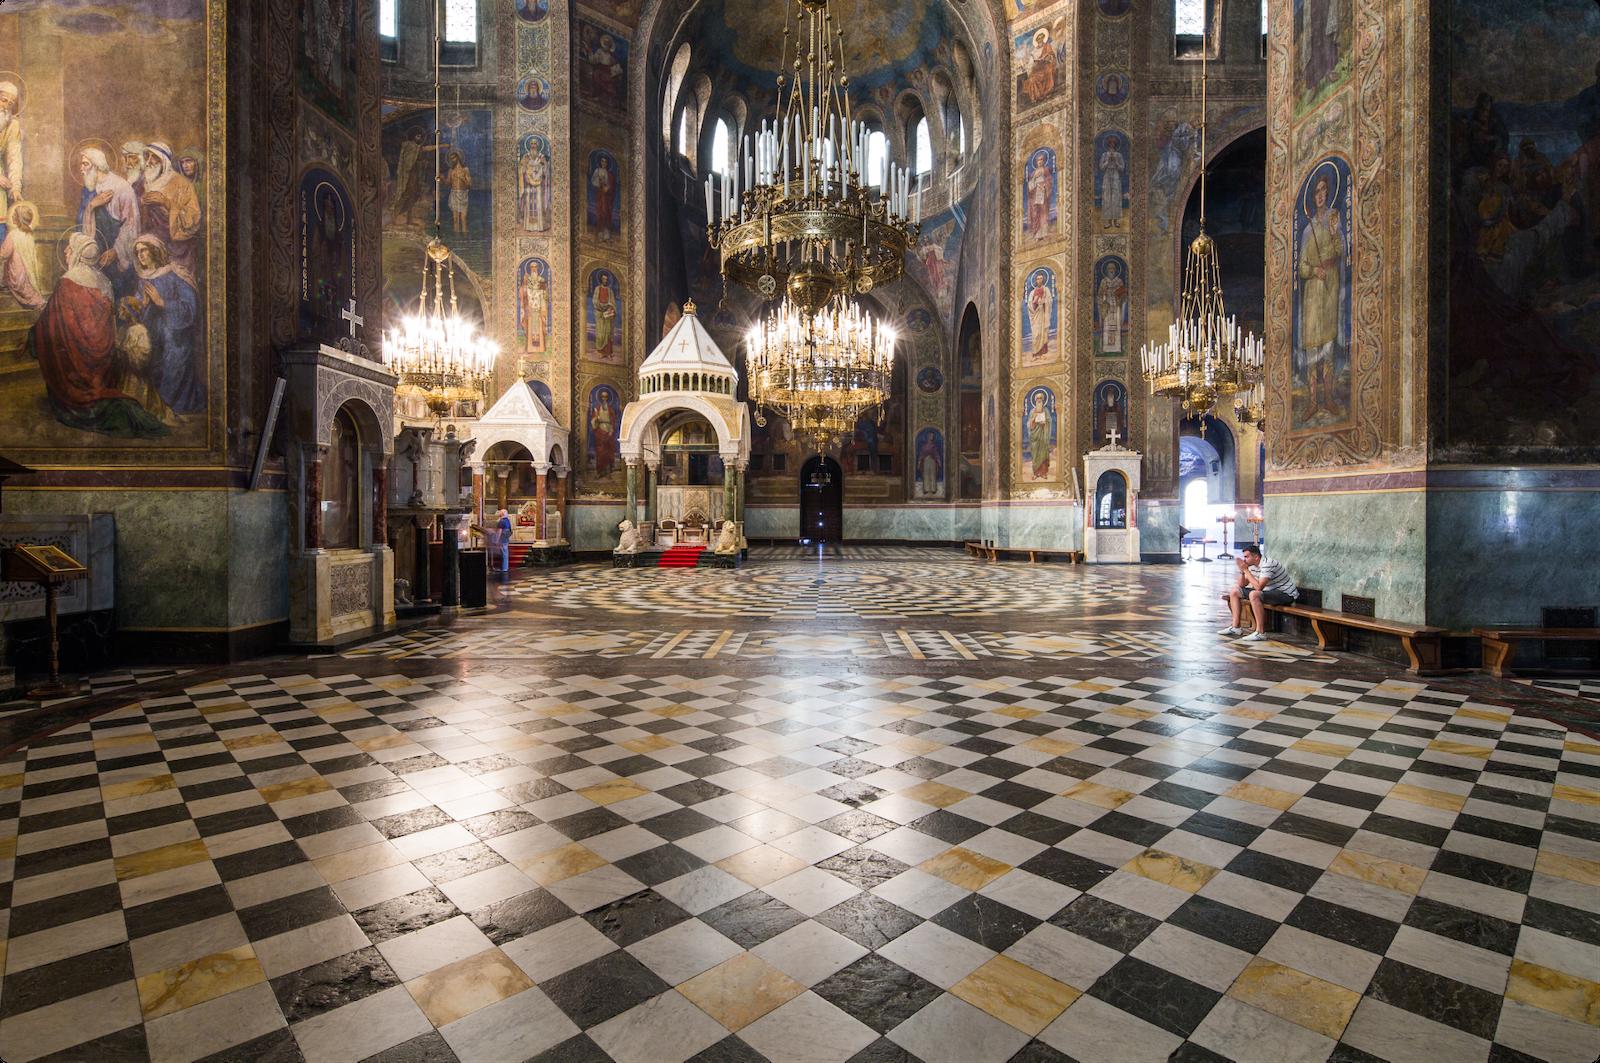 Church interior shot